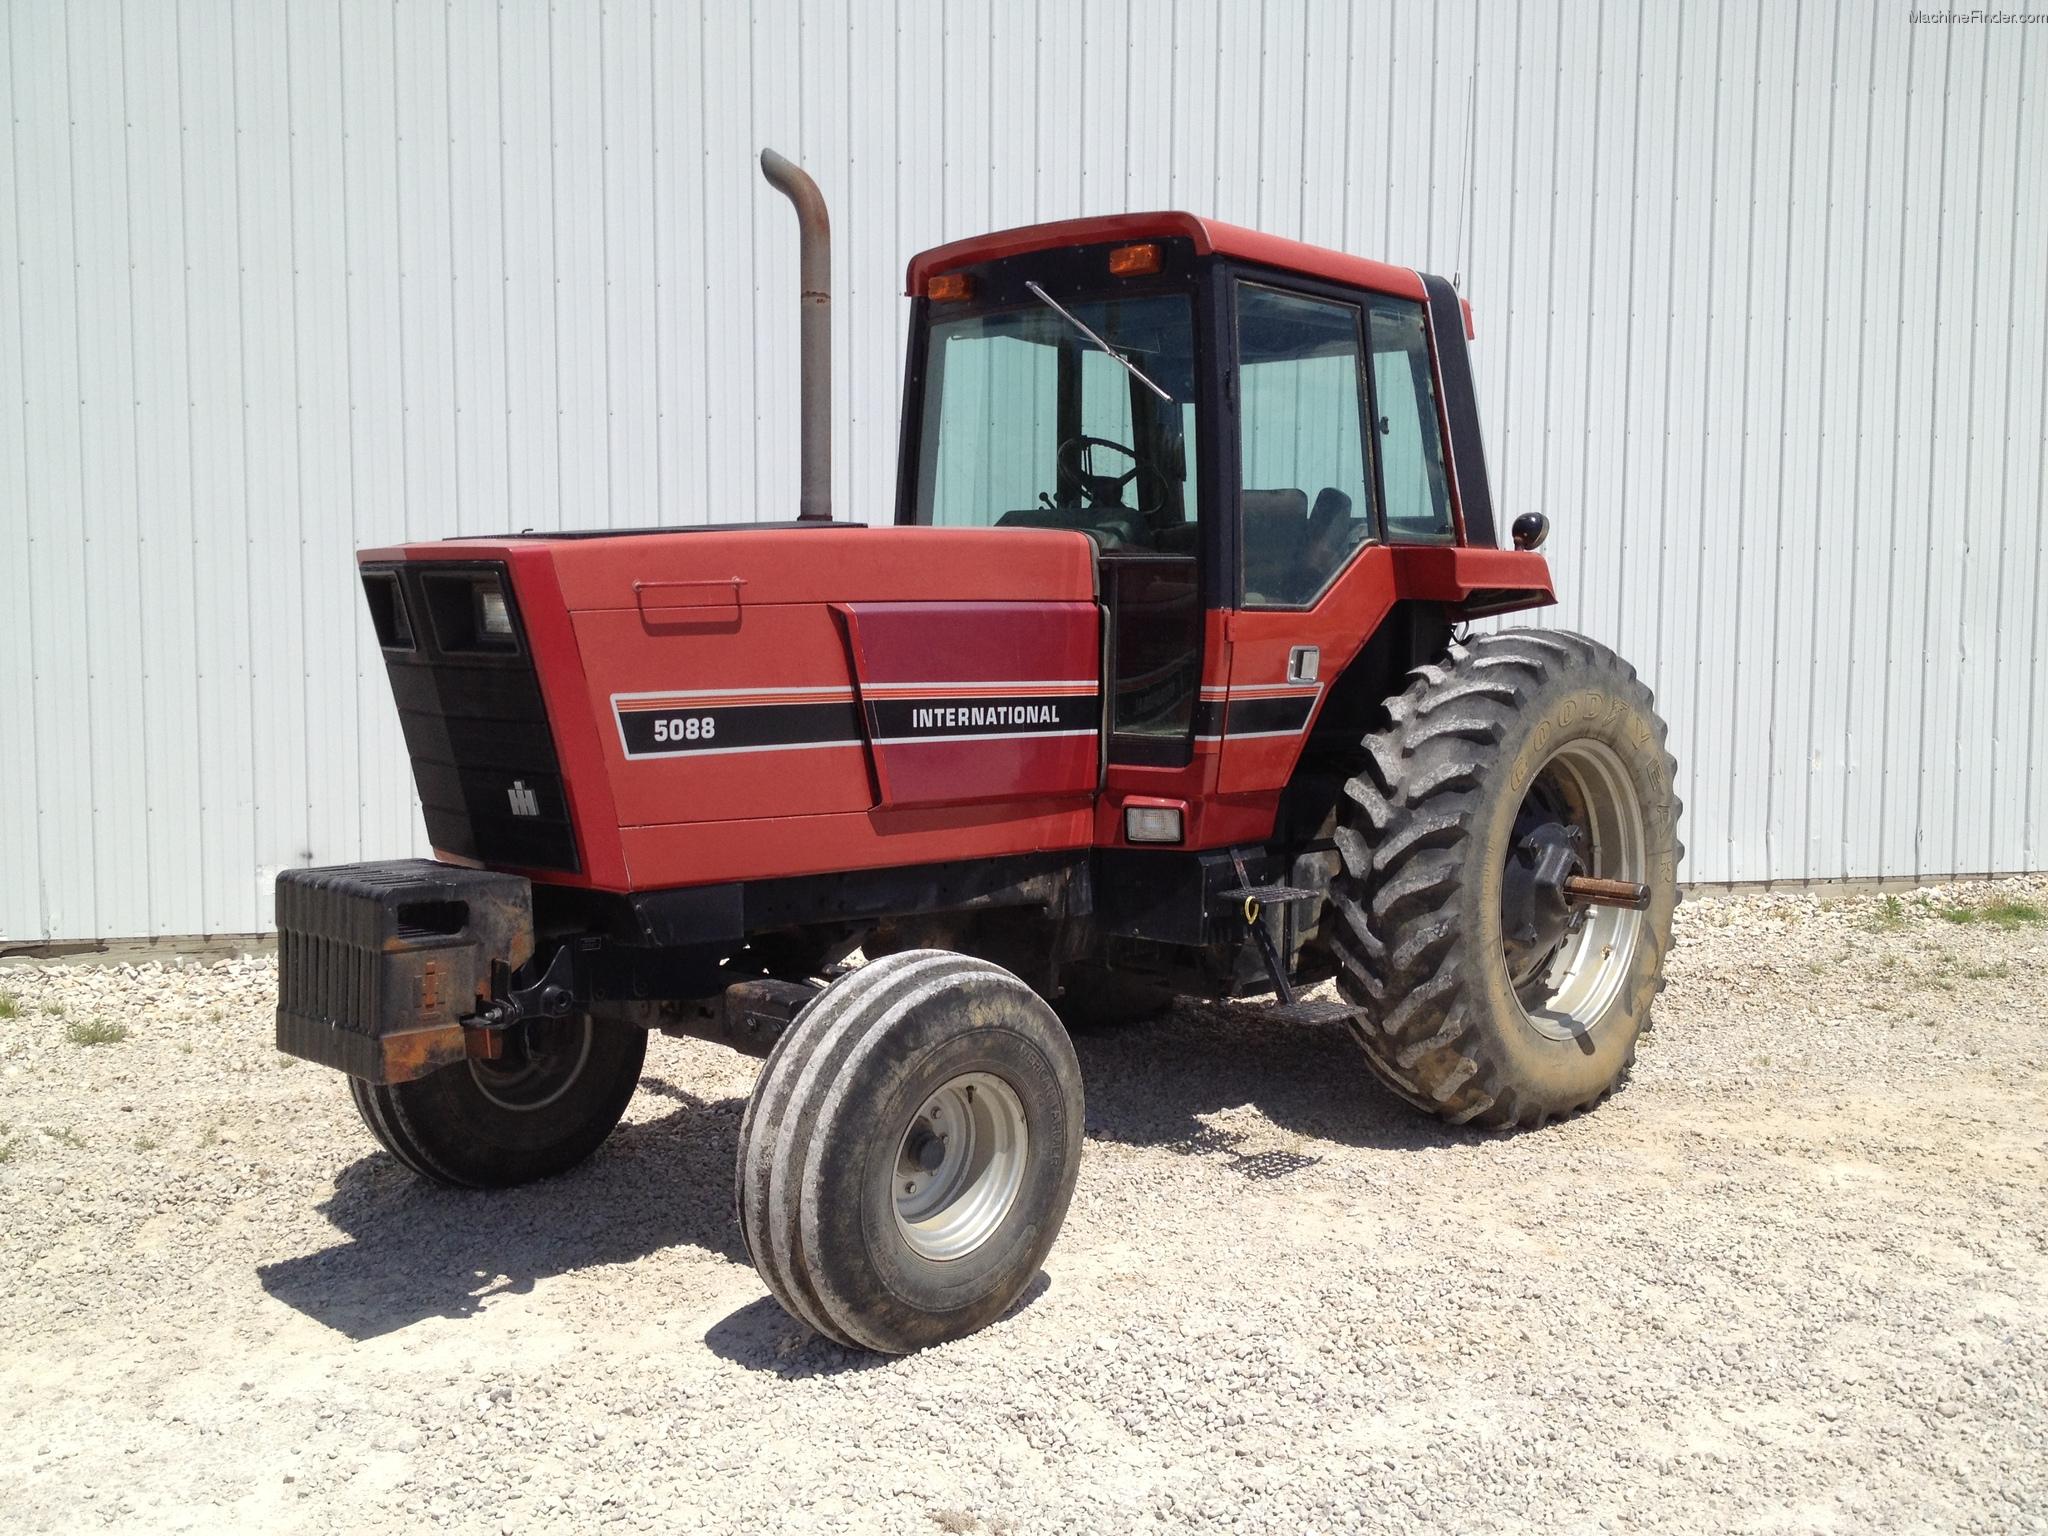 International Harvester 5088 : International harvester tractors row crop